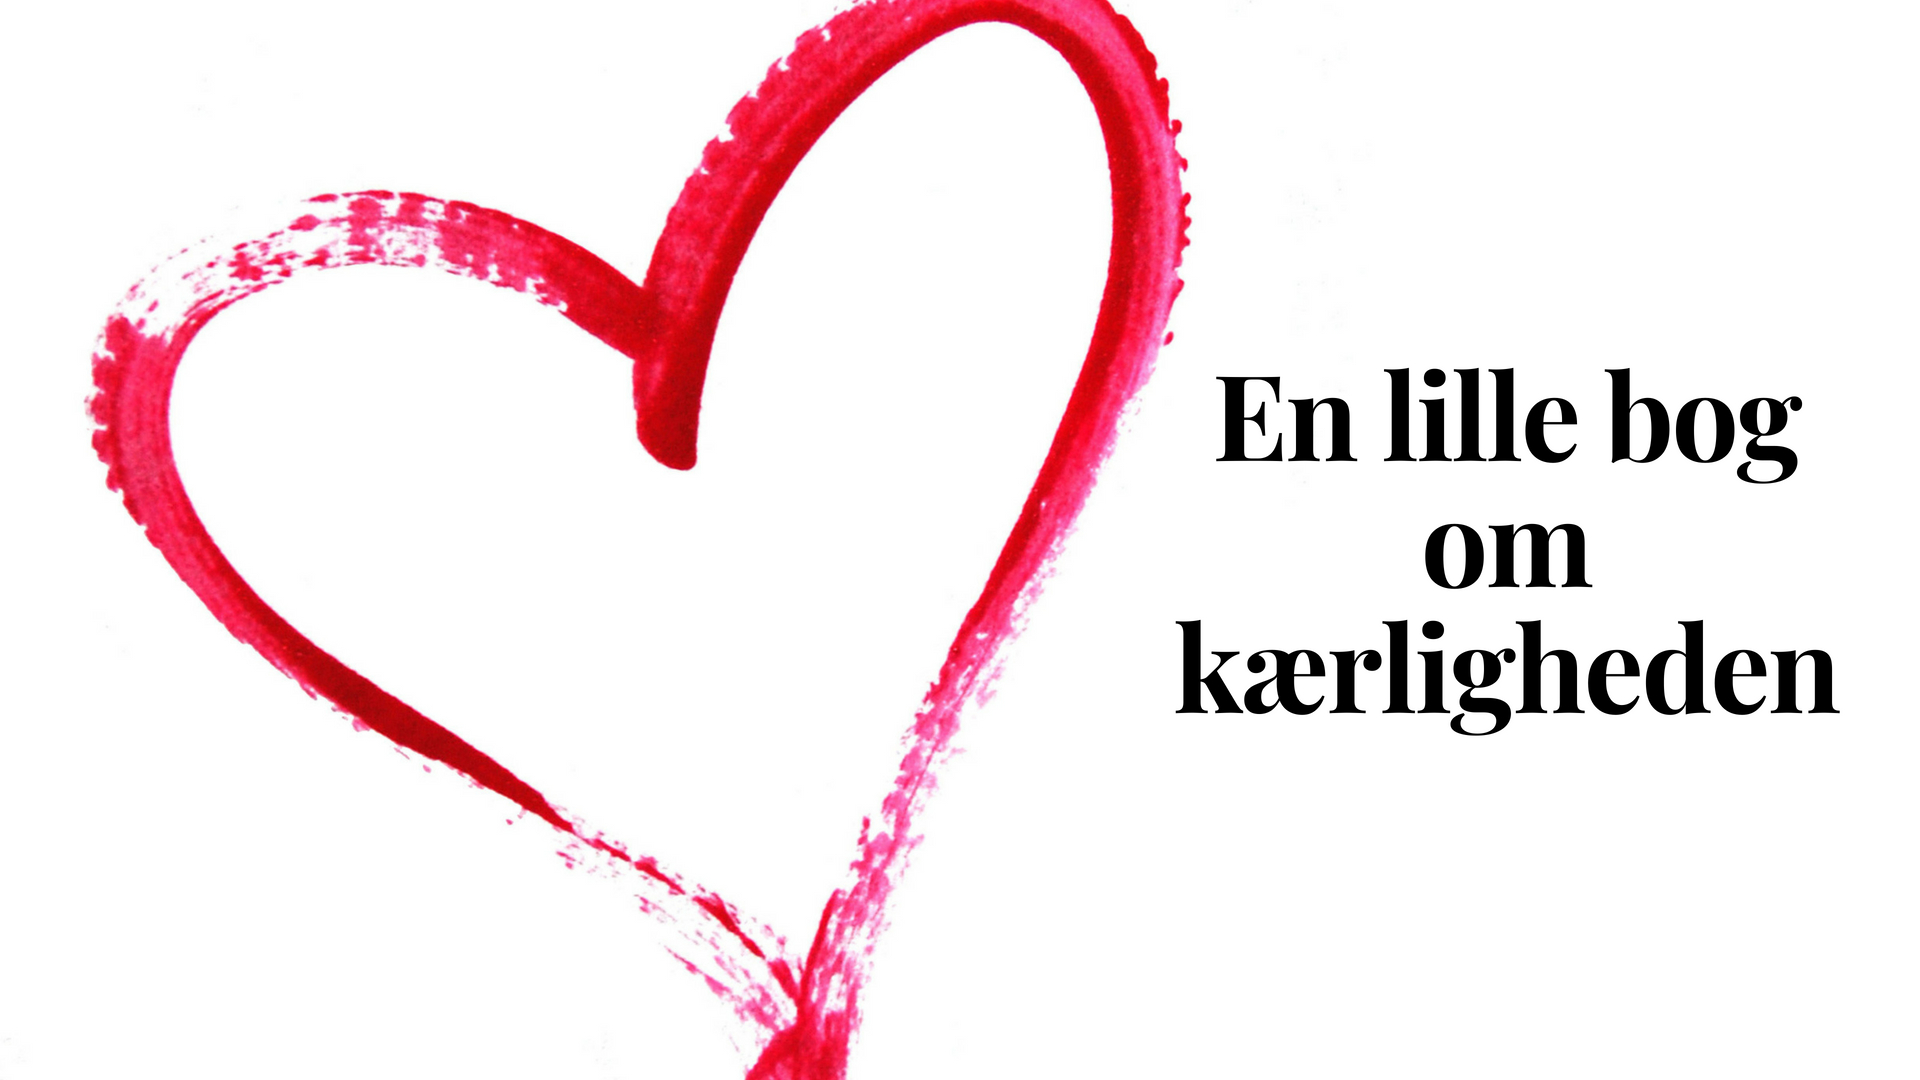 Kærlighed filosofi